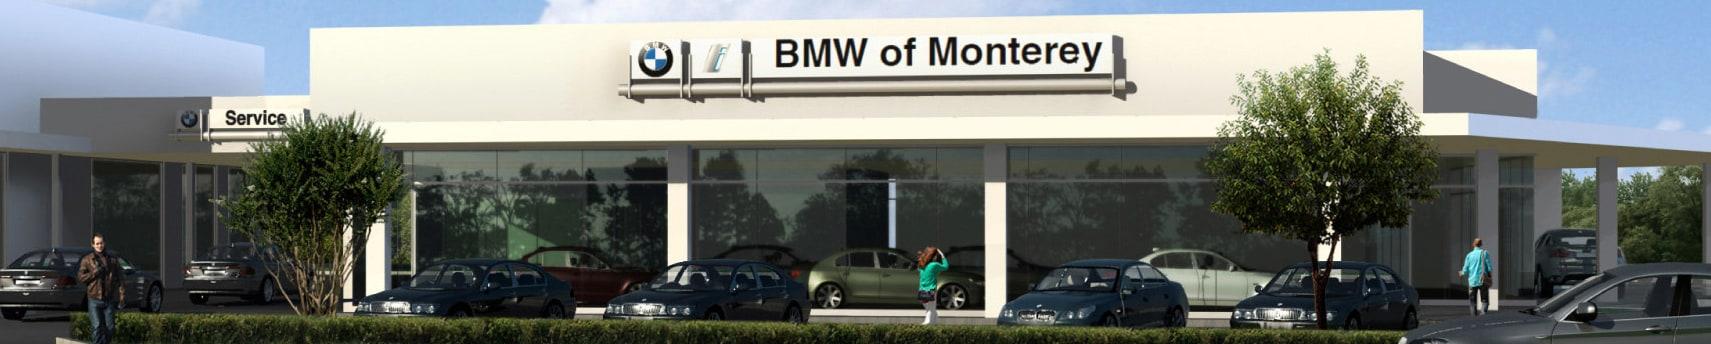 BMW Service & Auto Repair in Seaside, CA | BMW of Monterey